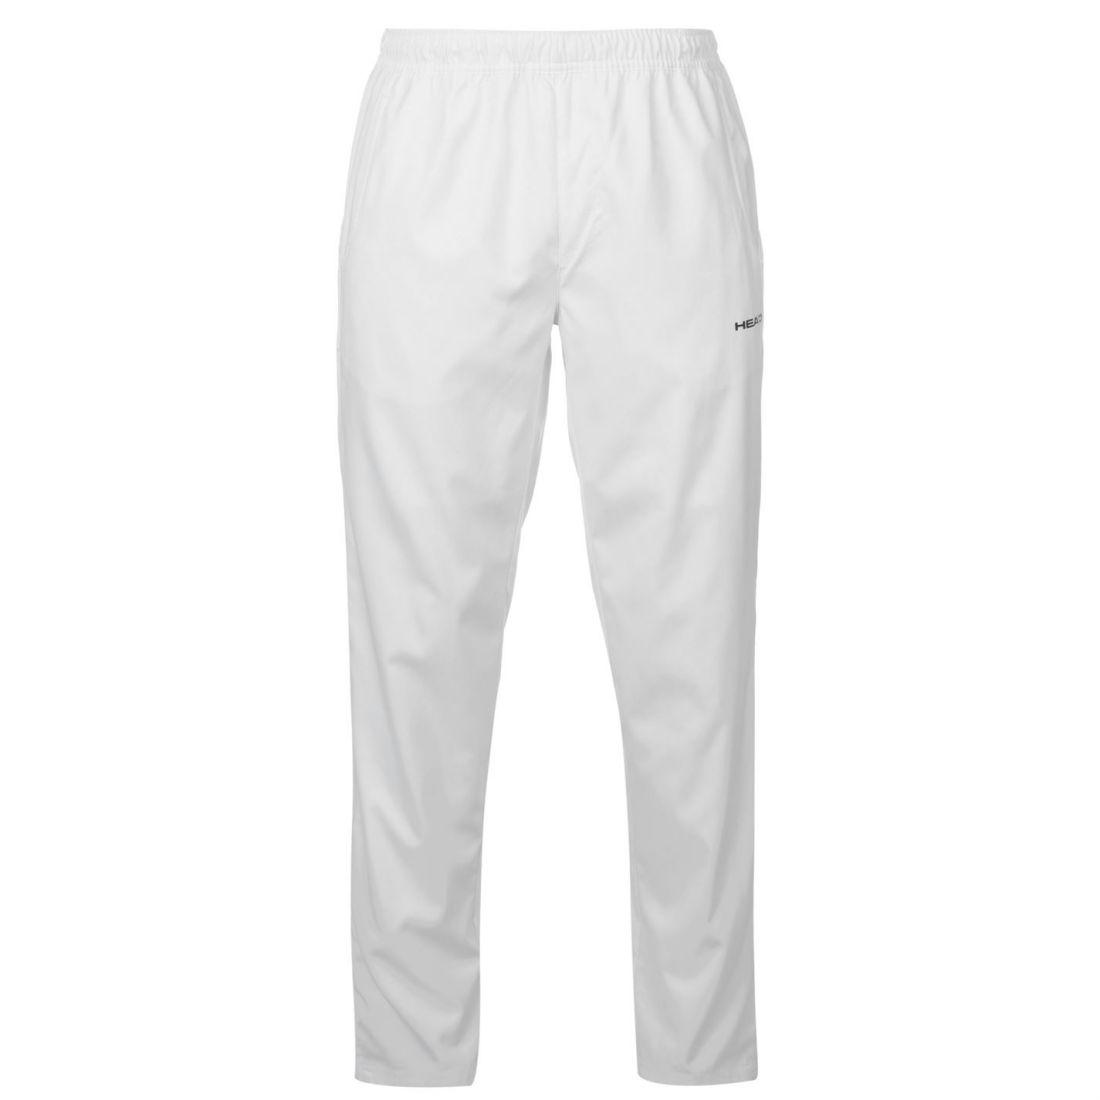 premium selection 4c522 7cfad Image is loading HEAD-Mens-Club-Match-Track-Pants-Trousers-Jogging-